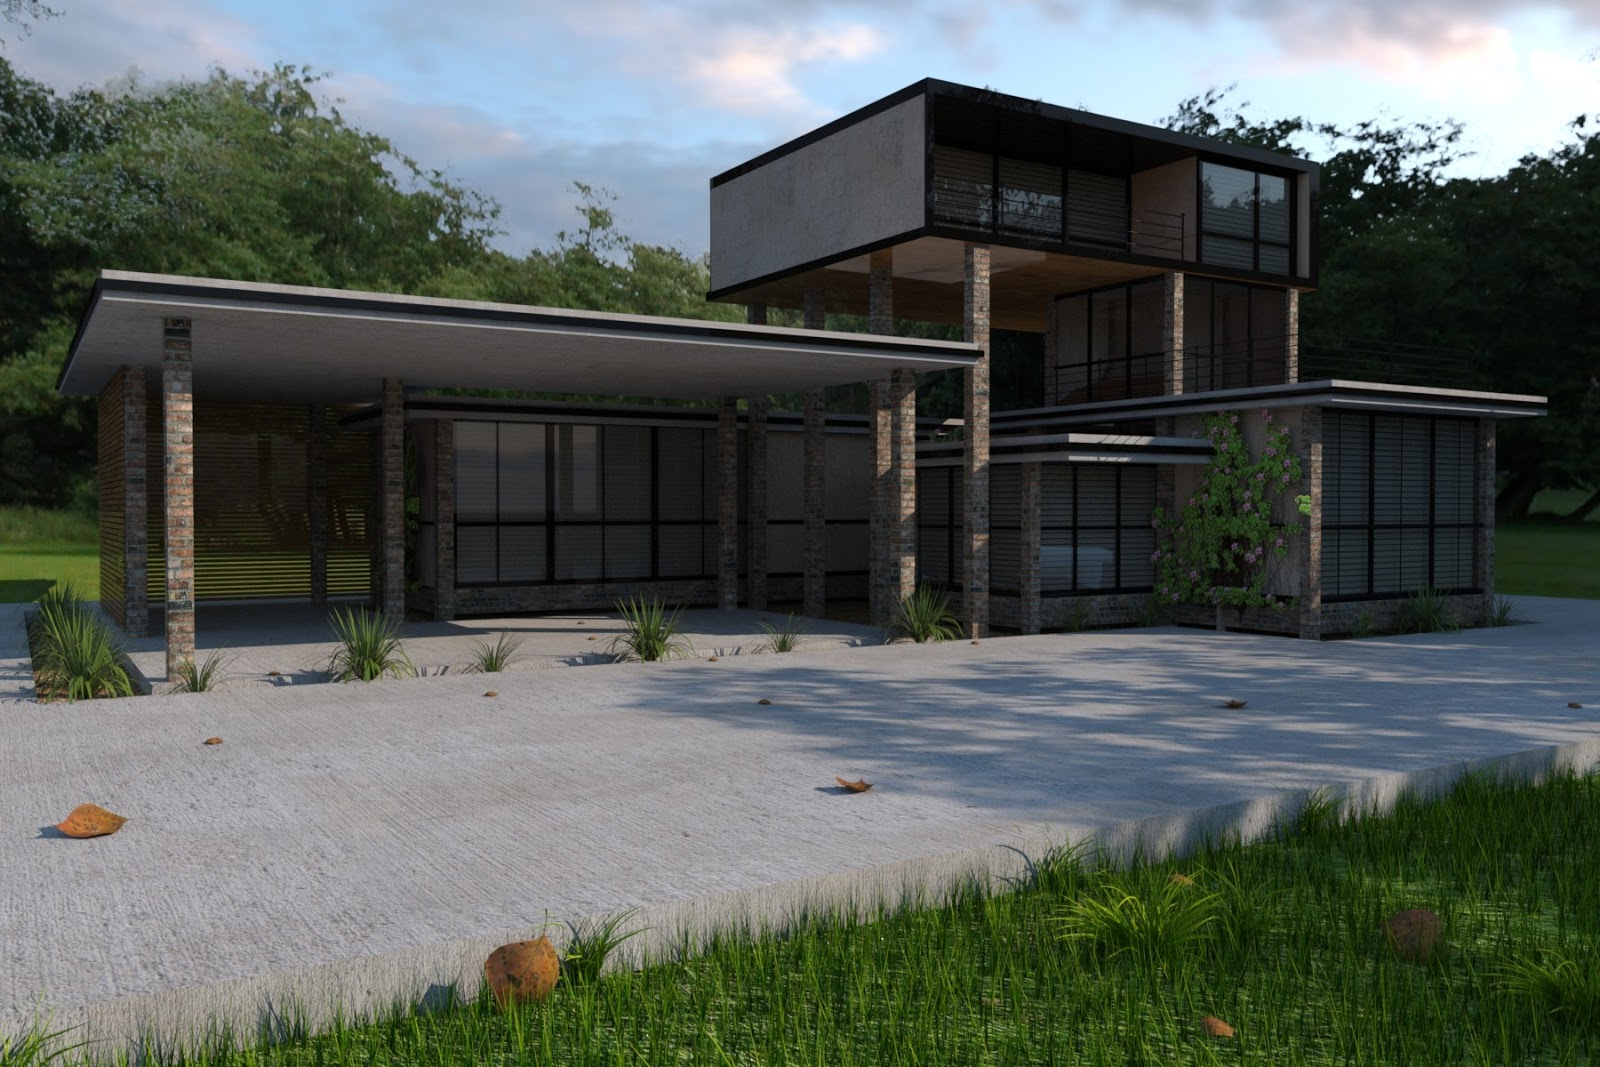 Download Daz Studio 3 For Free Daz 3d Modular Home Builder